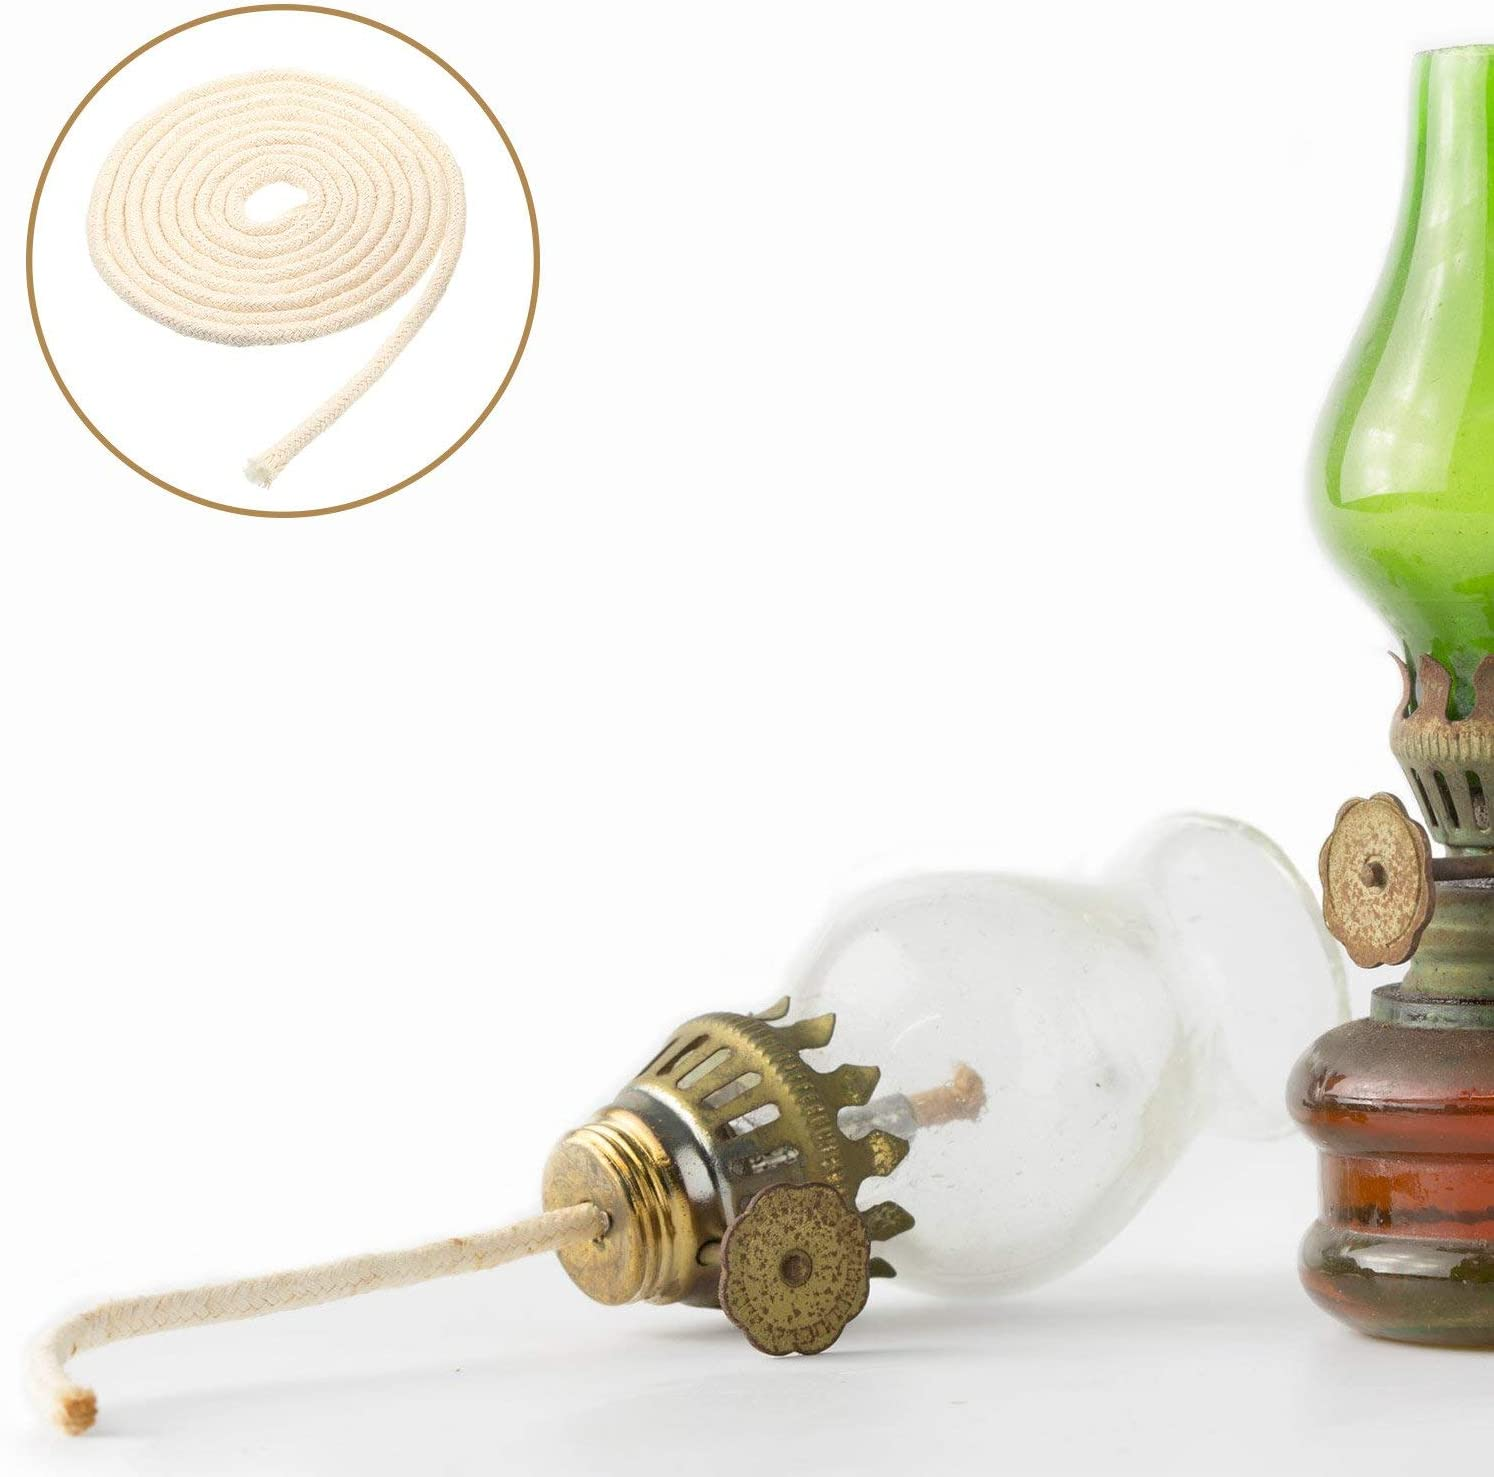 de algod/ón plano de aceite Rollo de mecha para l/ámpara de queroseno 1,8/m por rollo 1//2 Inch Width marr/ón